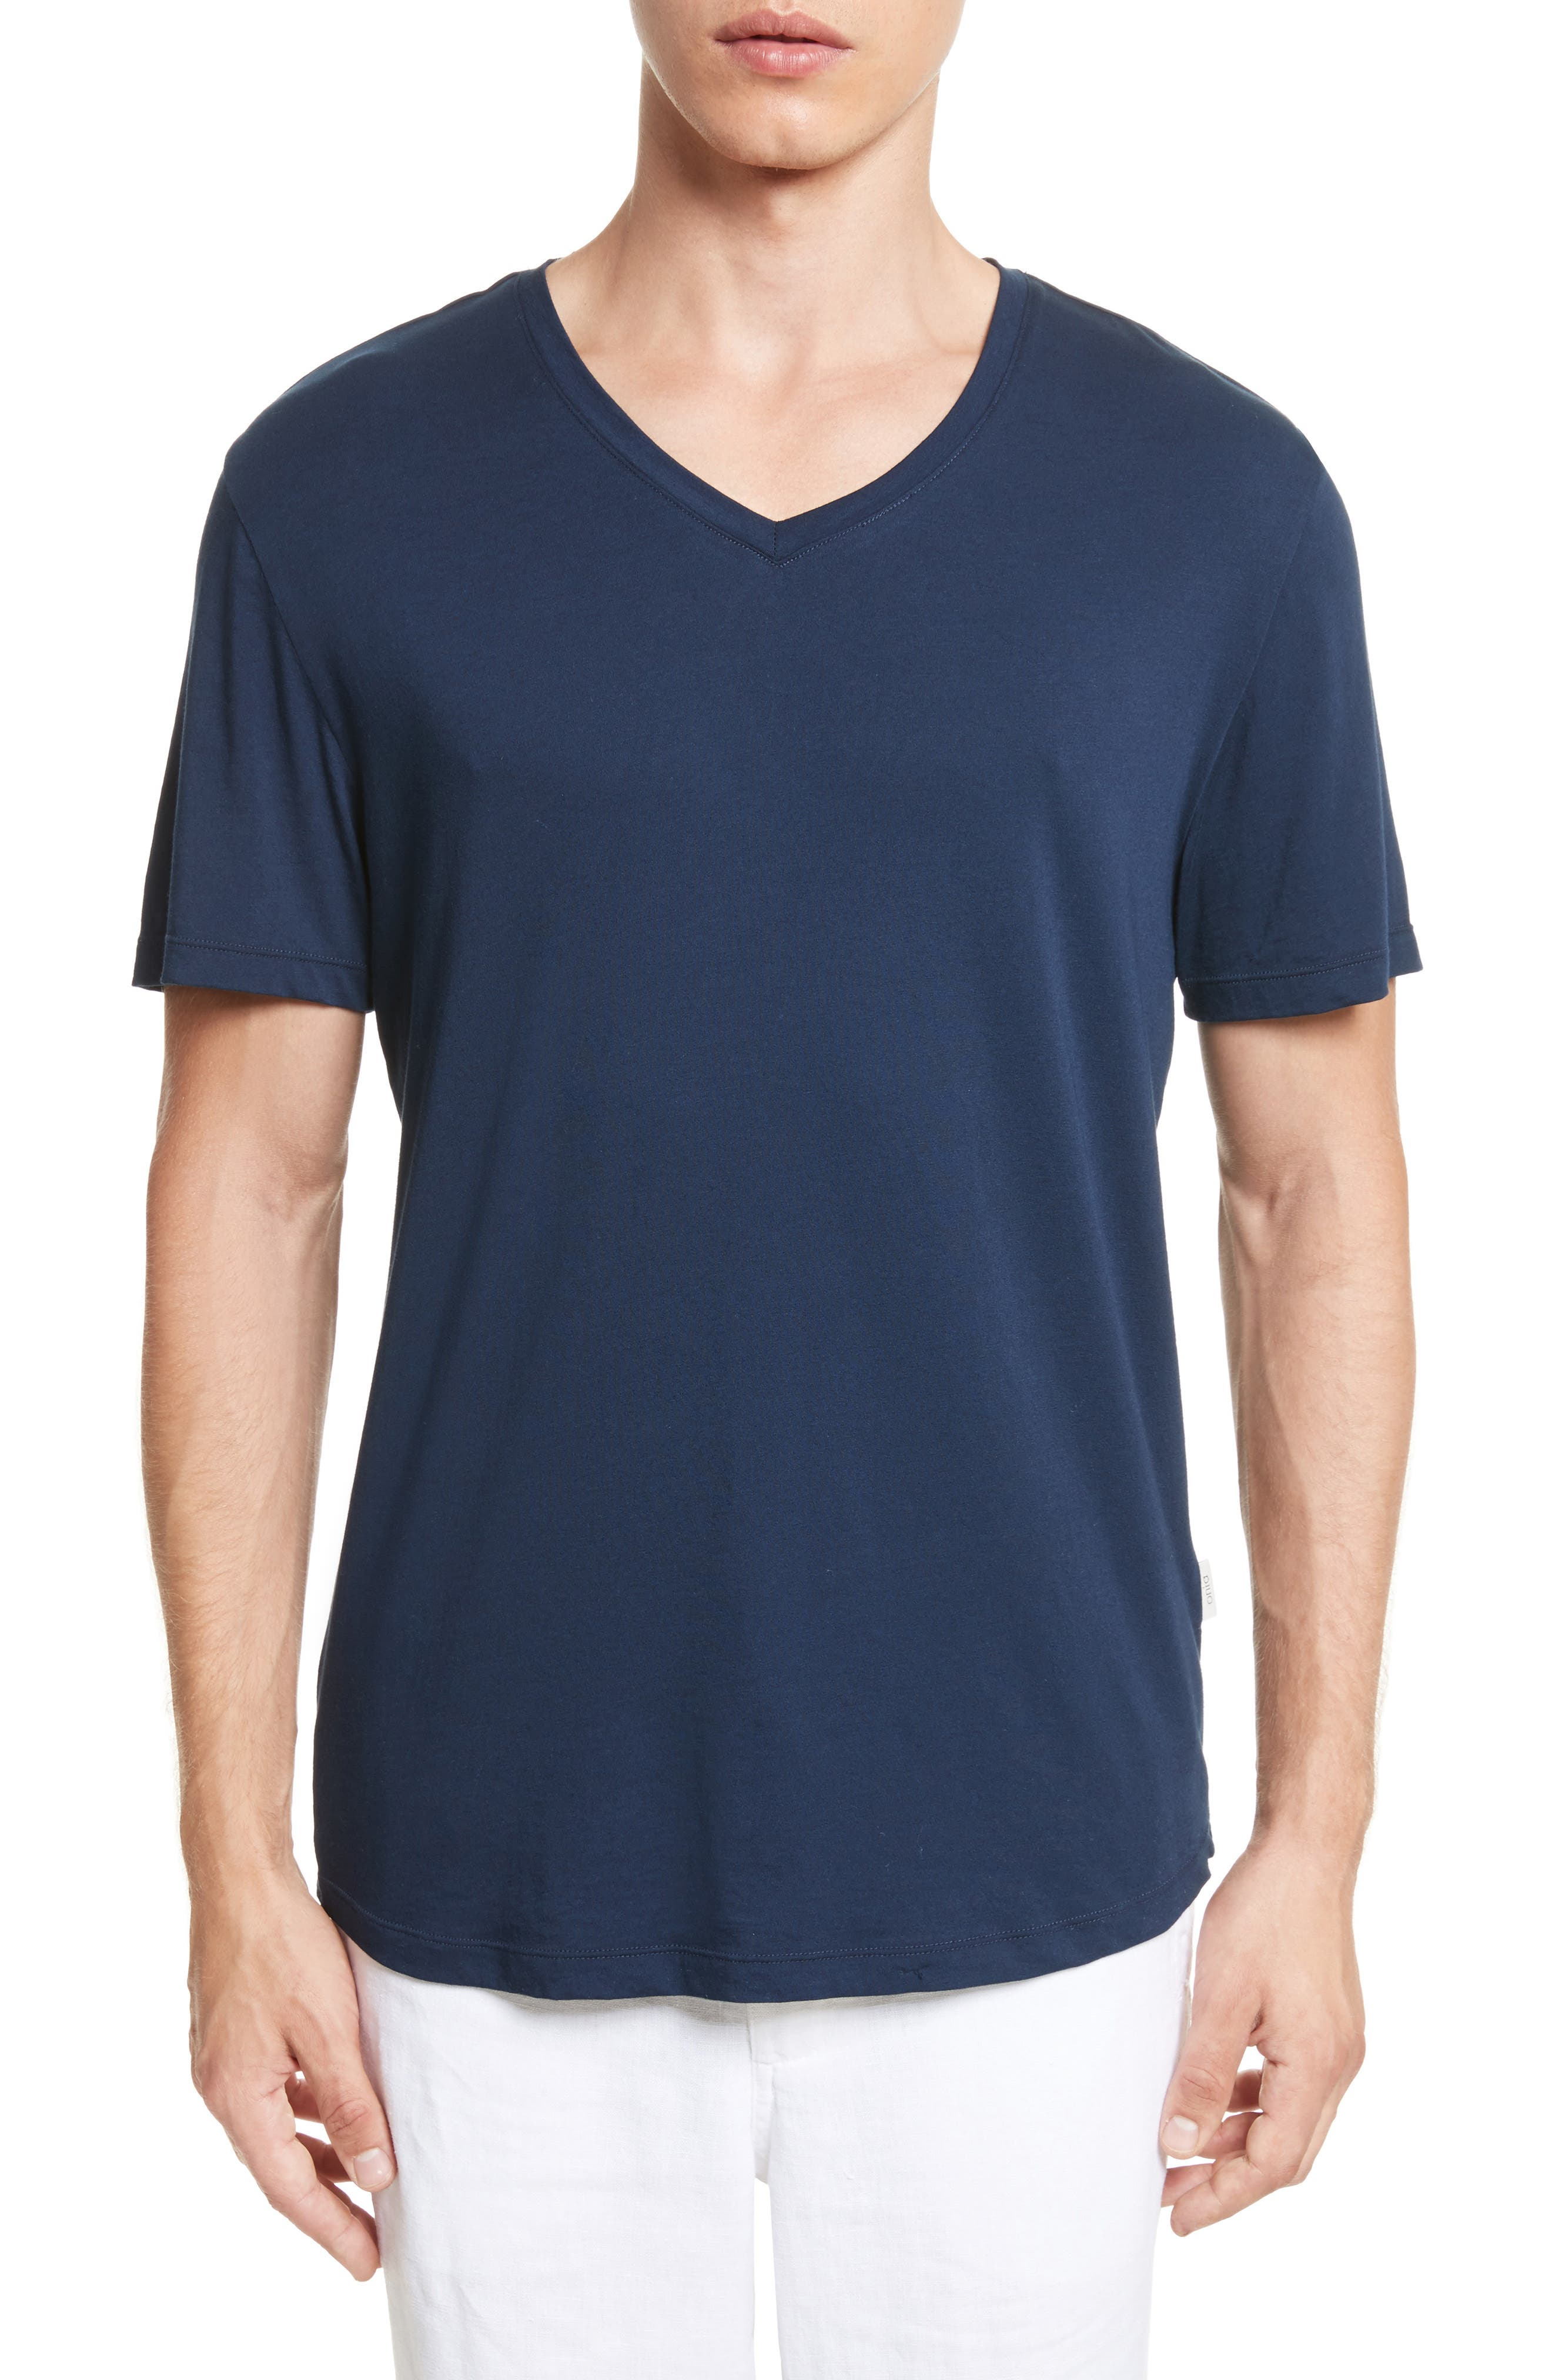 Main Image - ONIA Joey V-Neck T-shirt